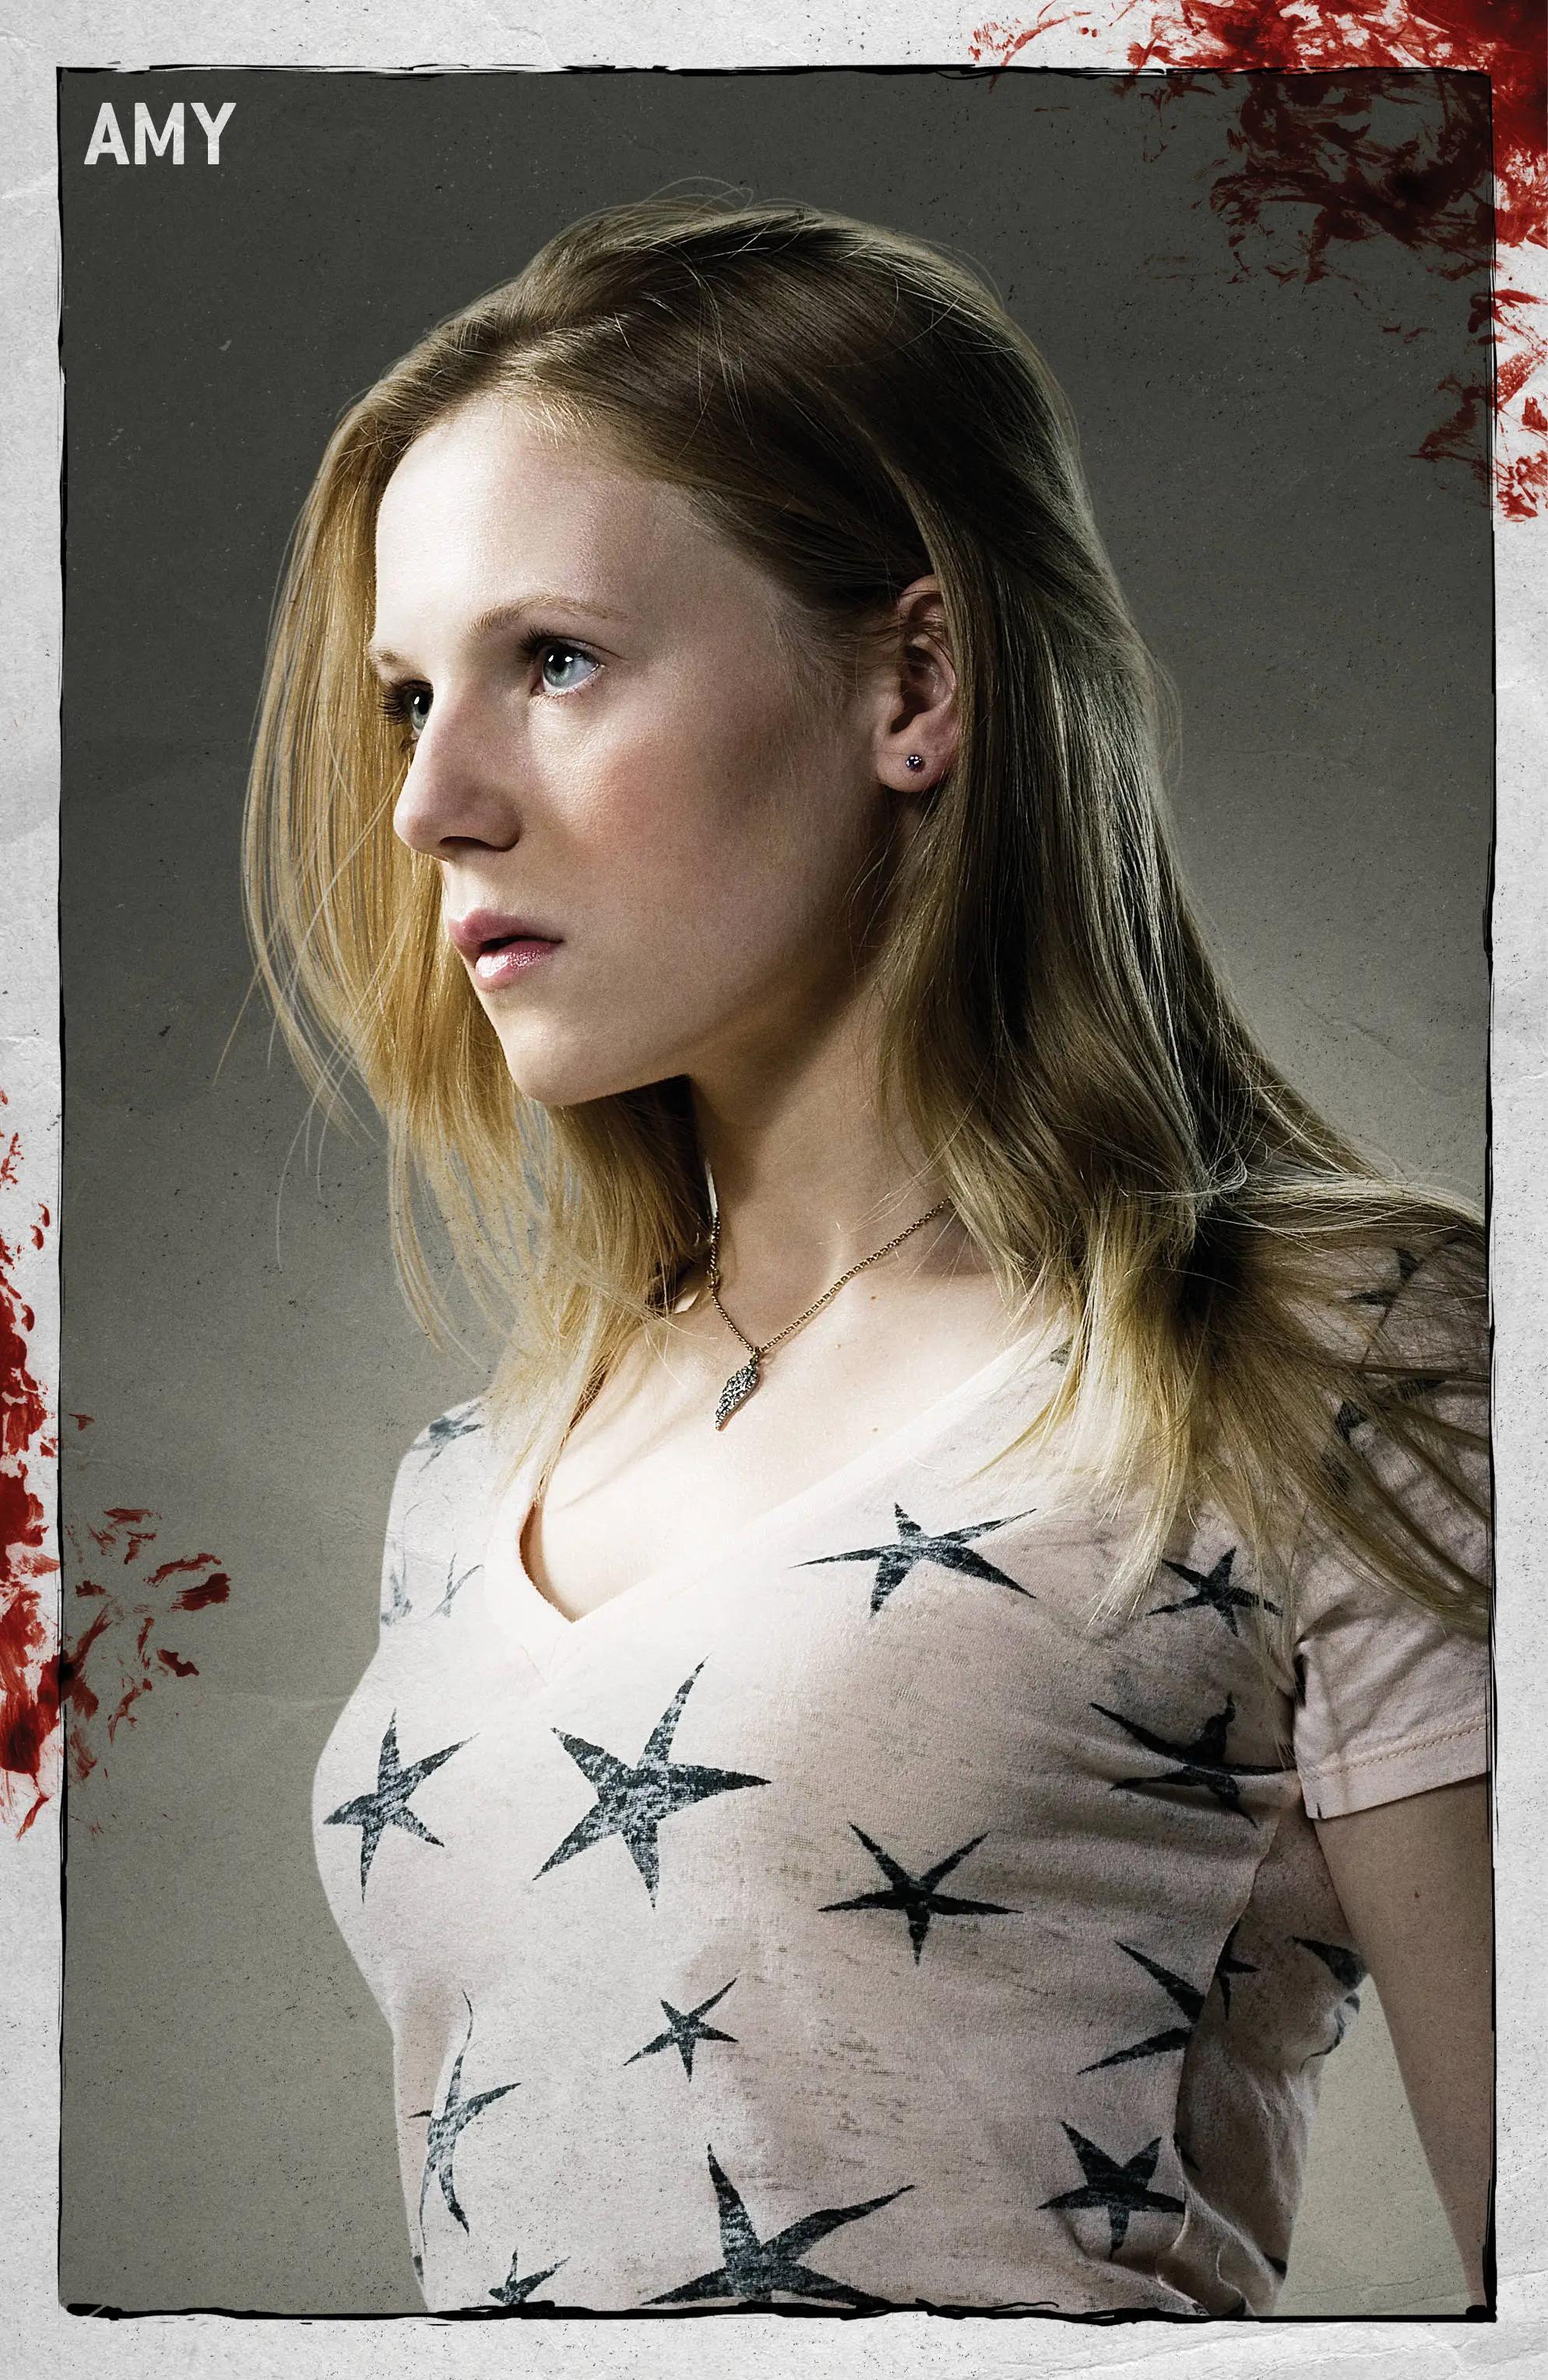 Amy (TV Series)/Gallery